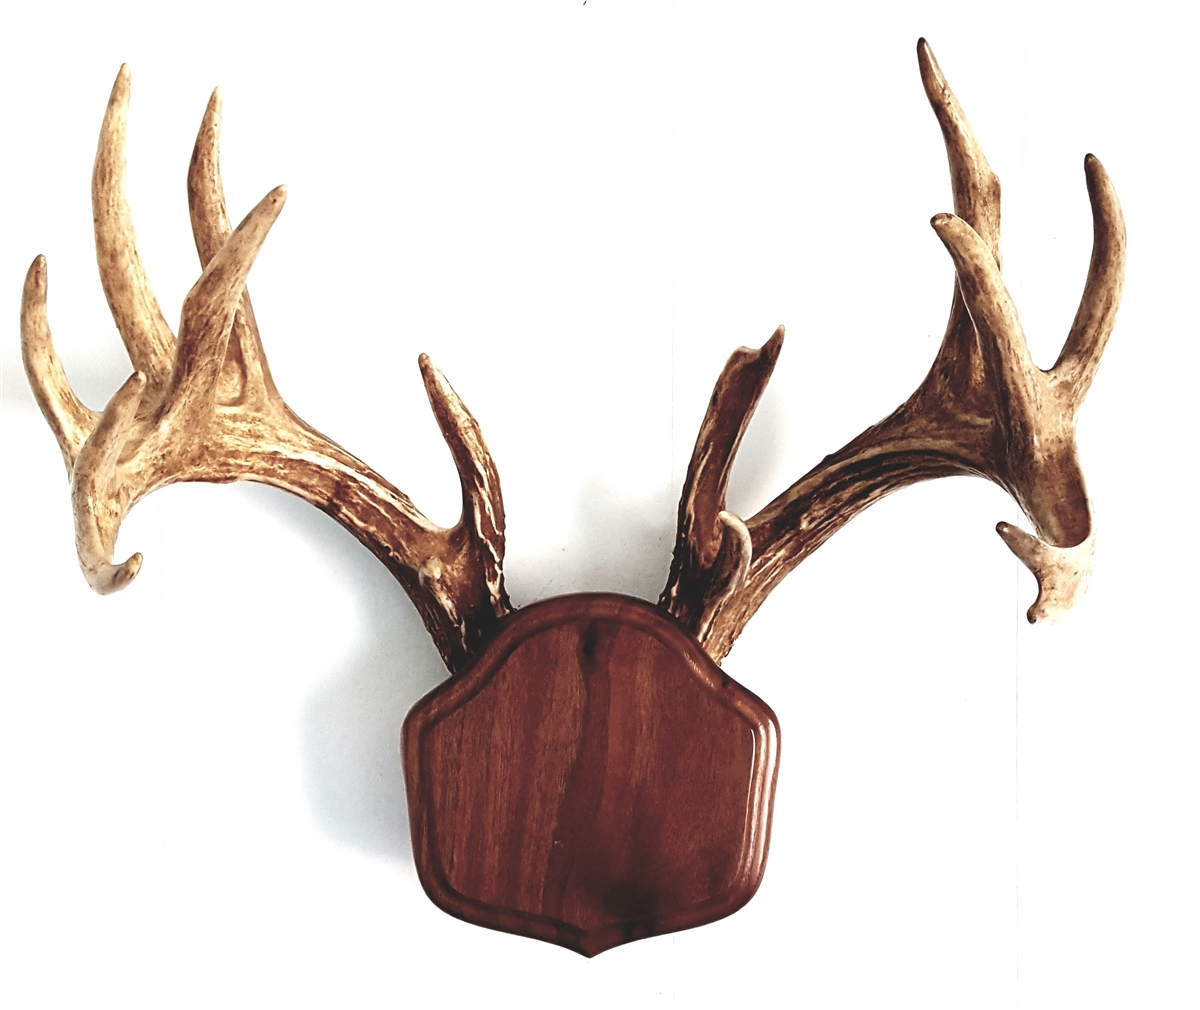 Deer antler mounting kit instructions - Deer Antler Mounting Kit Instructions 12